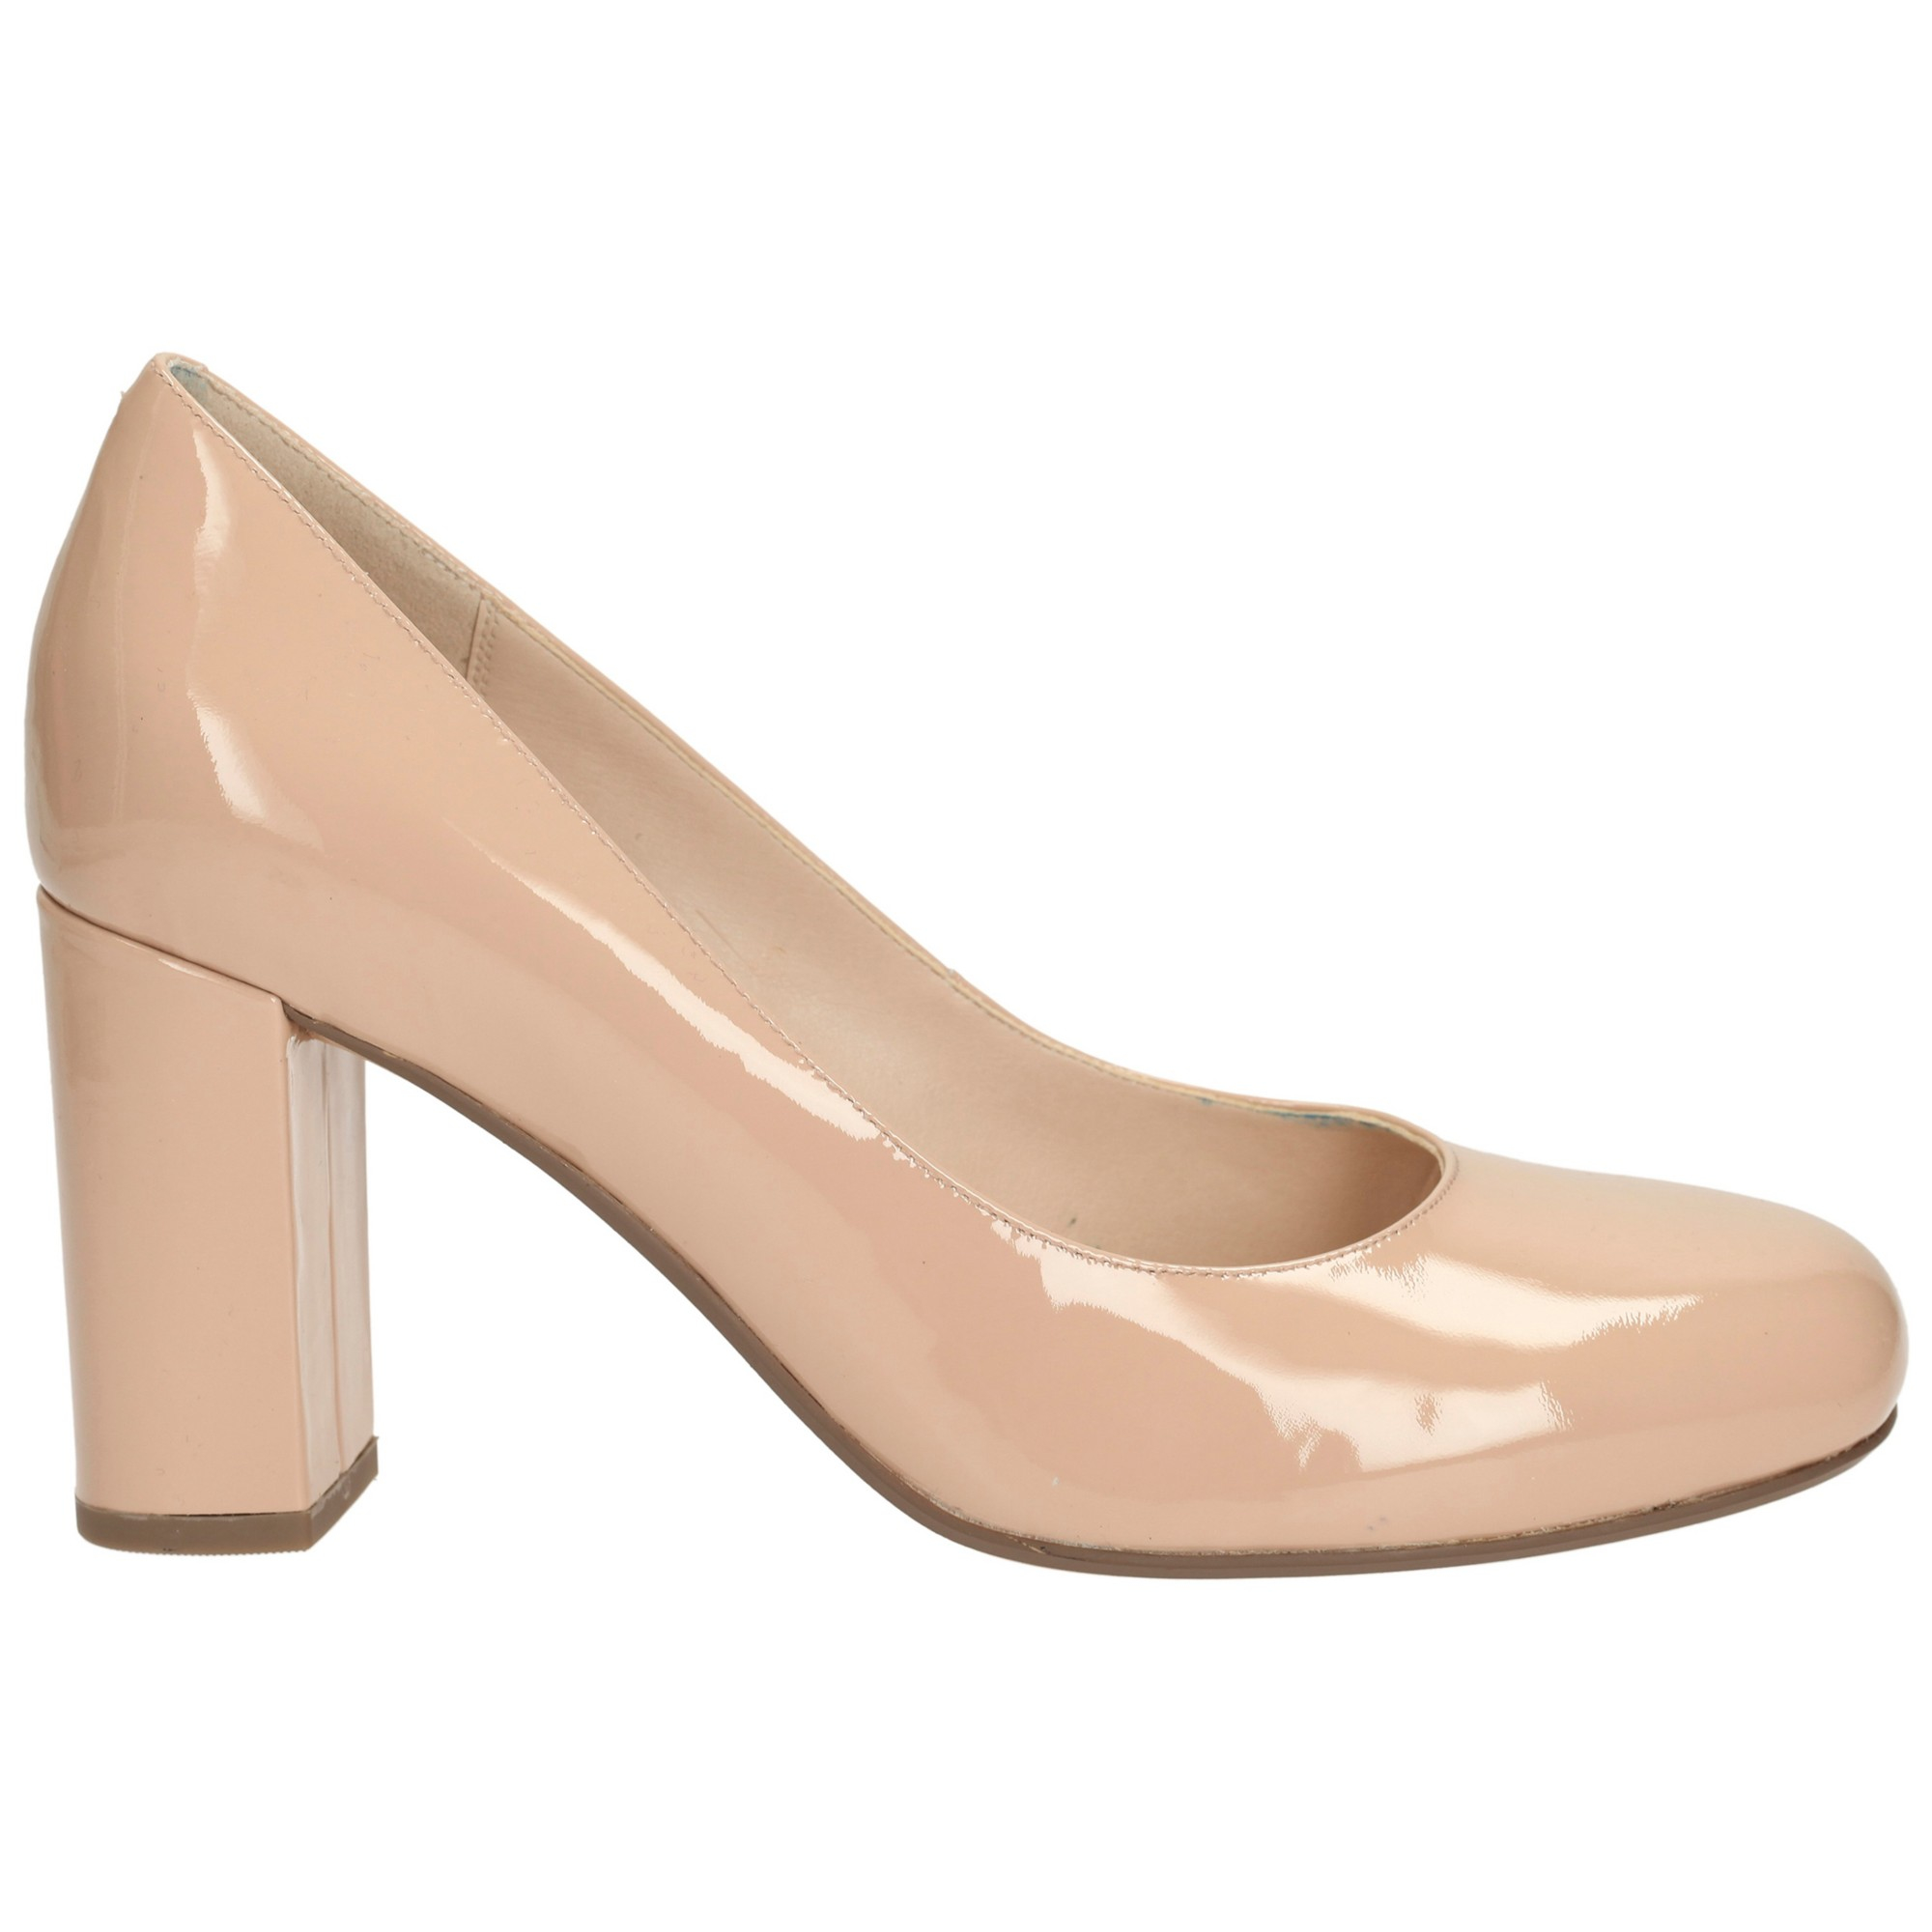 cadc043352349 Clarks Gabriel Mist Block Heel Court Shoes in Natural - Lyst